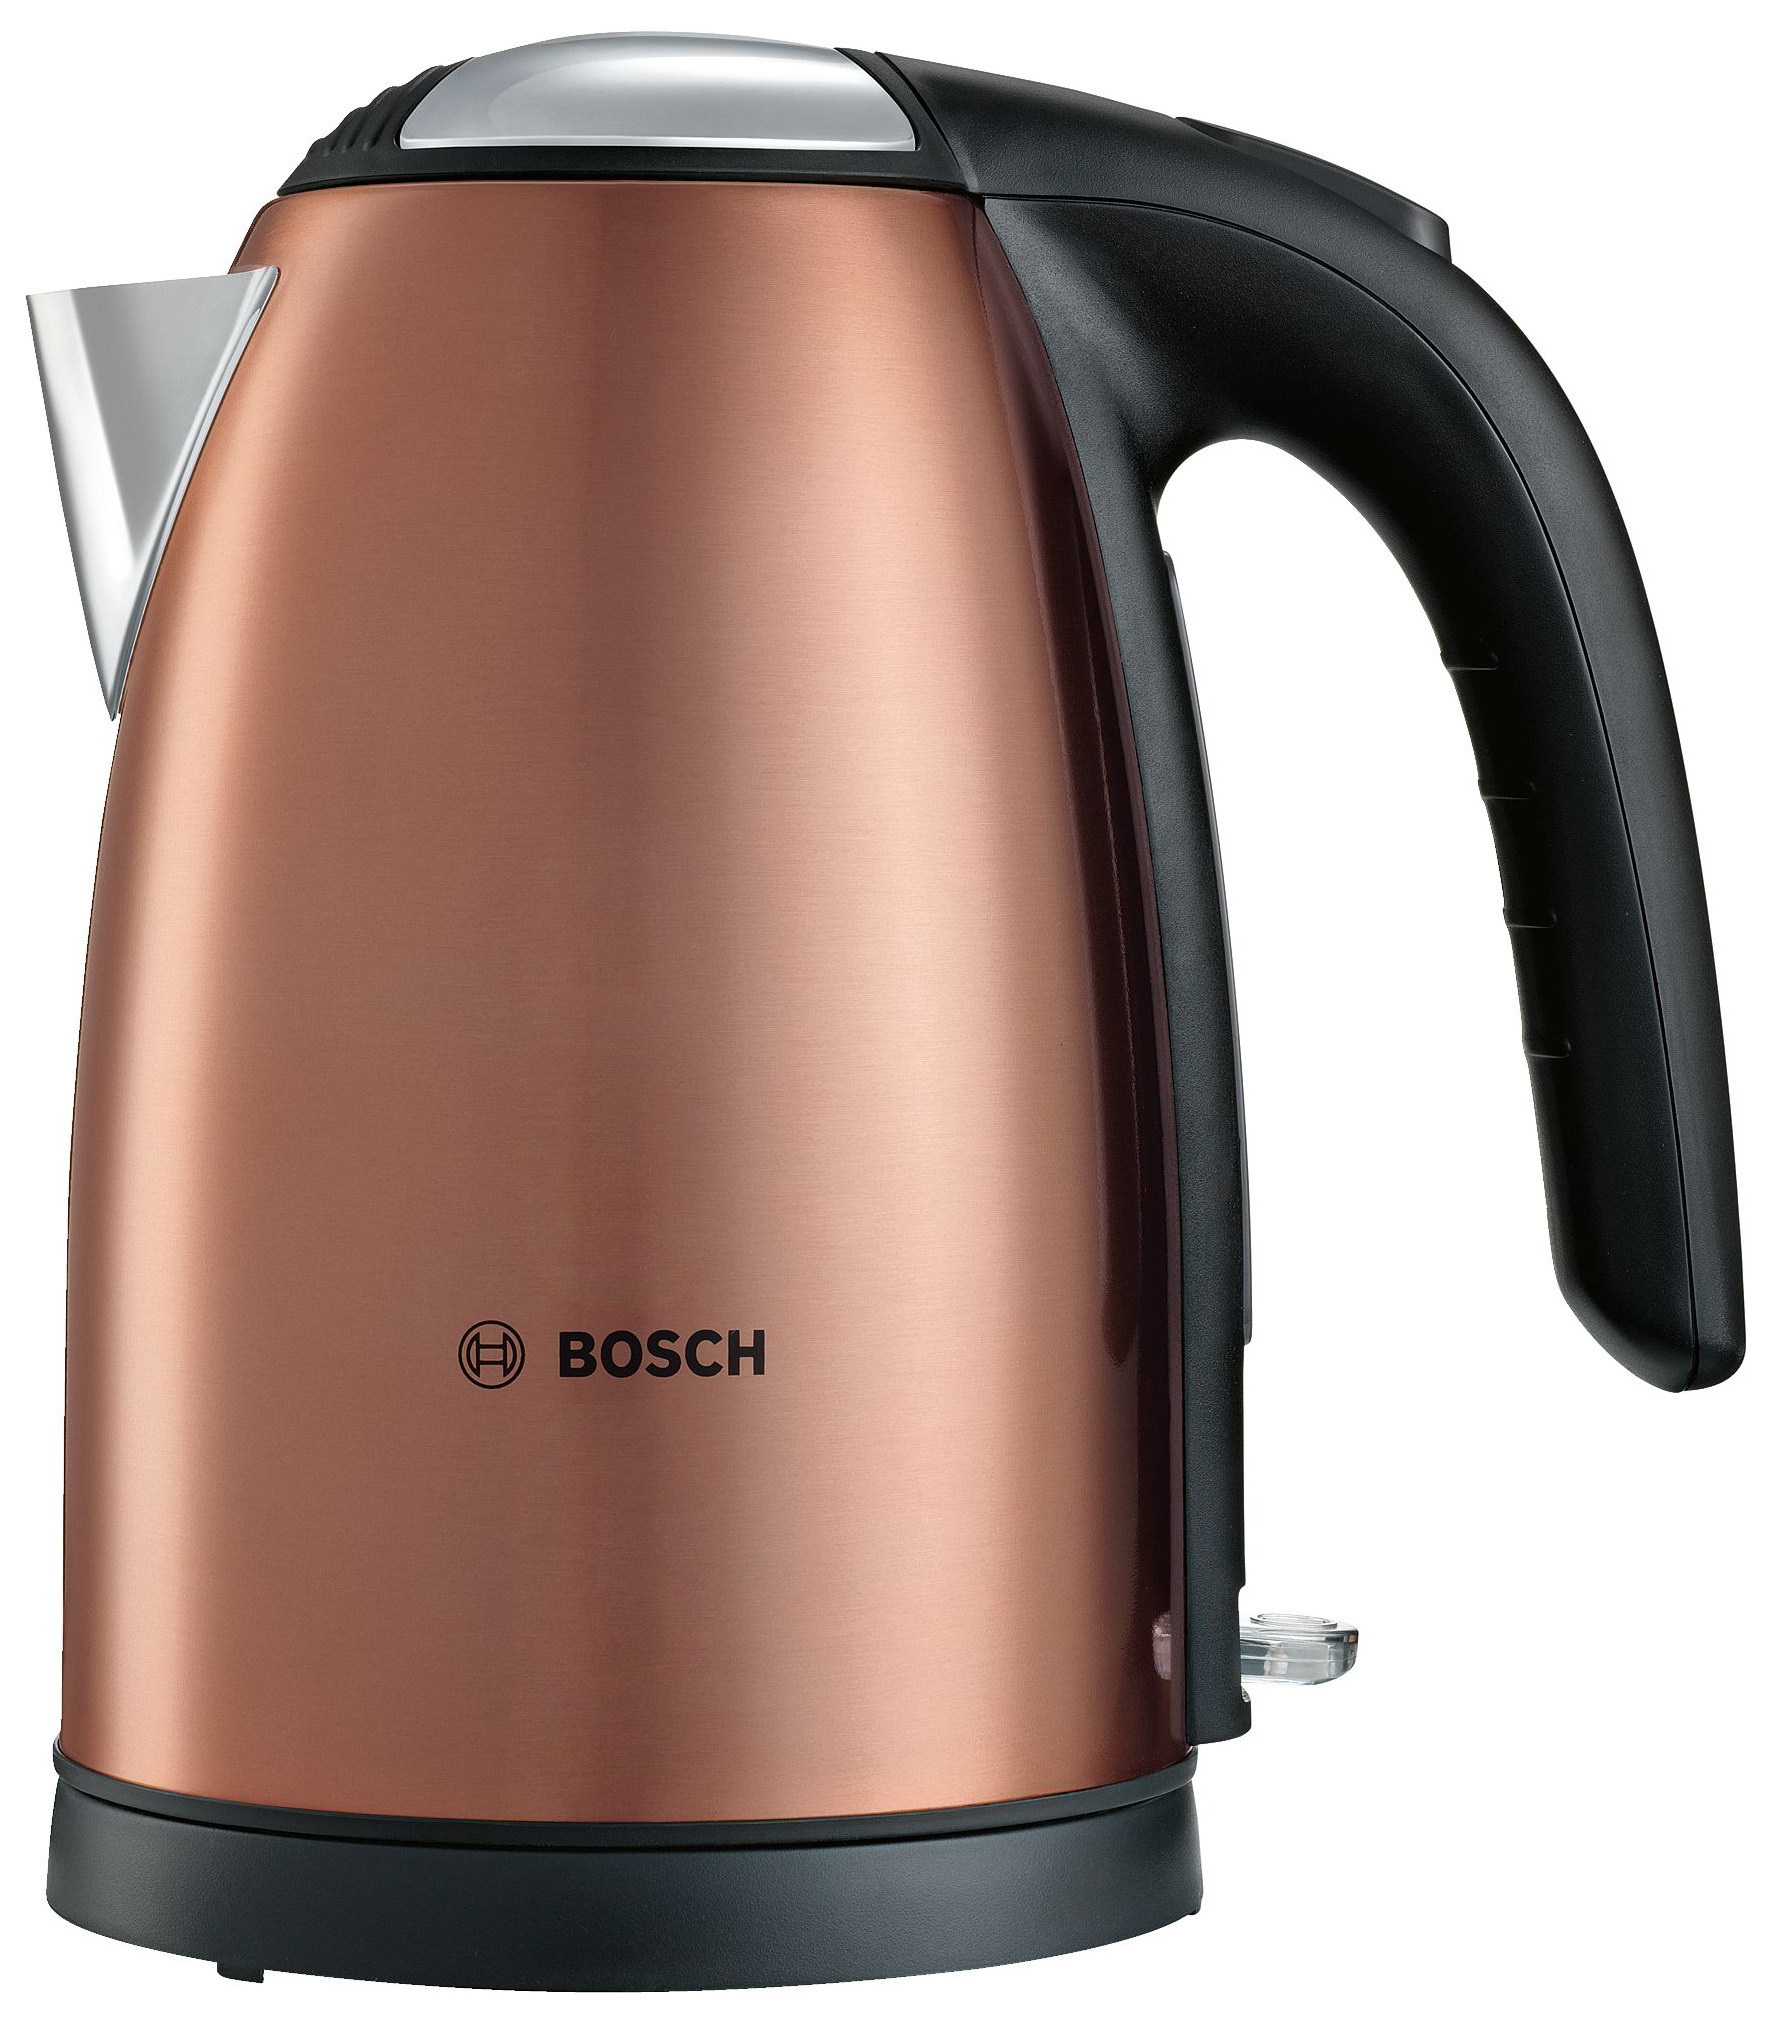 Чайник электрический Bosch TWK7809 Brown